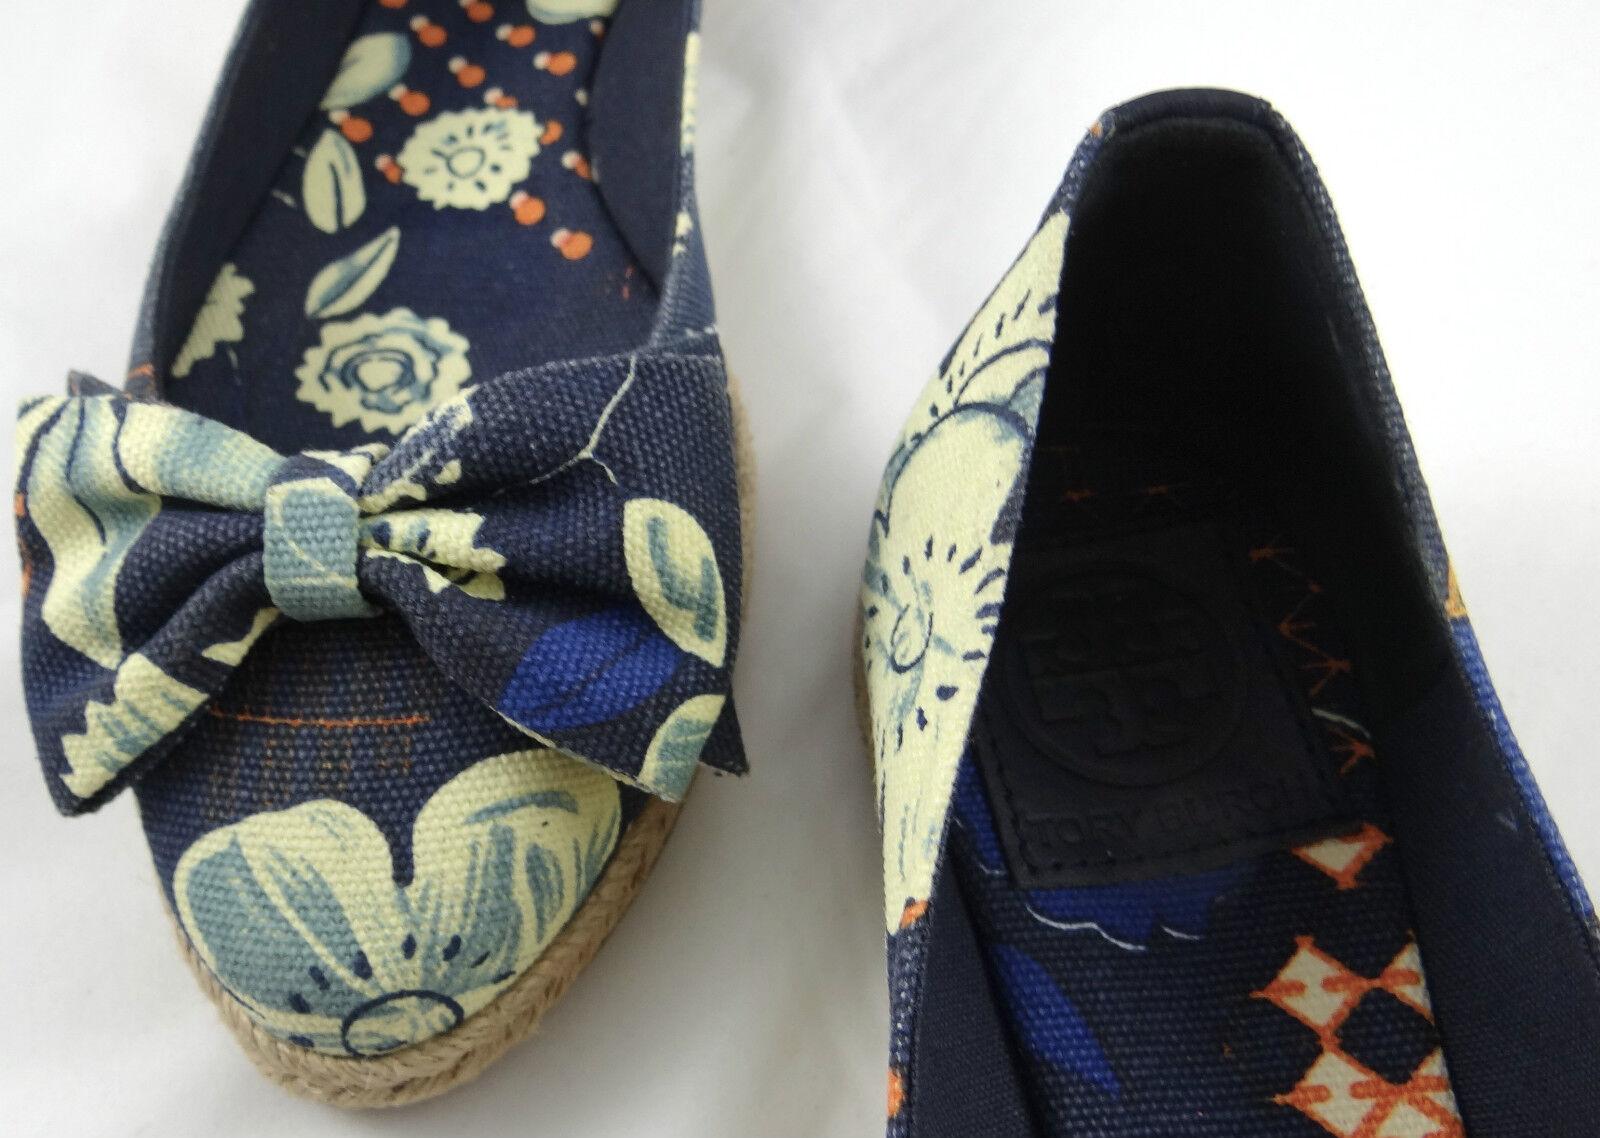 Tory Burch Tamsin Alpargatas Sin 5-11 Cordones Zapatos Planos 5-11 Sin f43e58